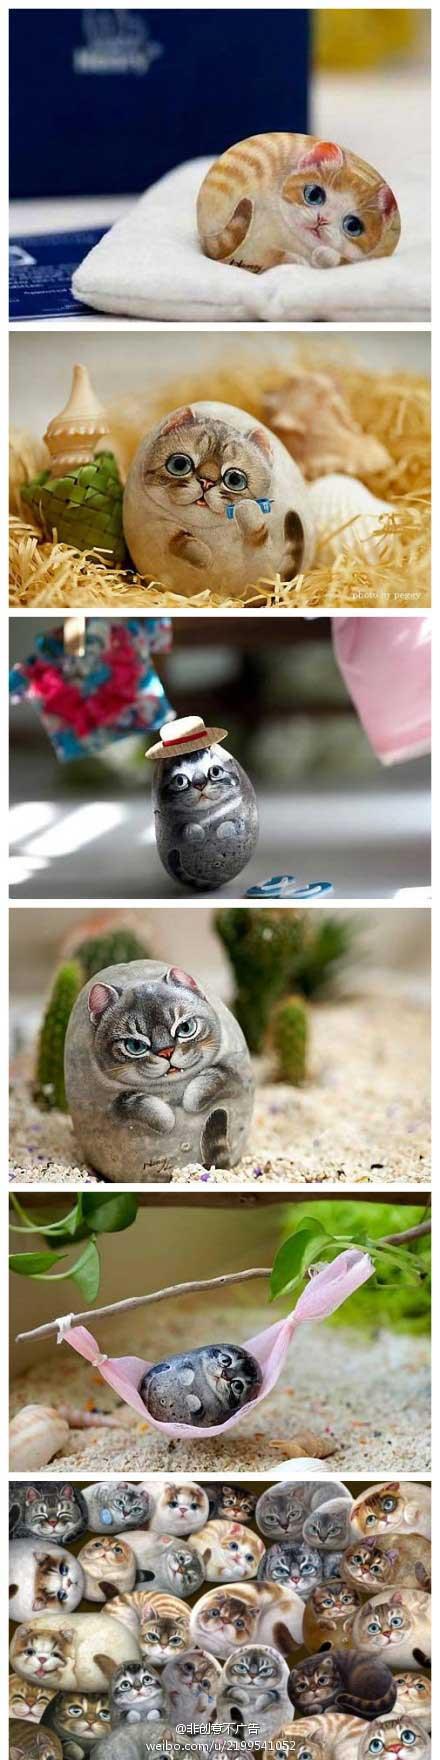 نقاشی کردن روی سنگ , تزیین سنگ, رنگ آمیزی سنگ